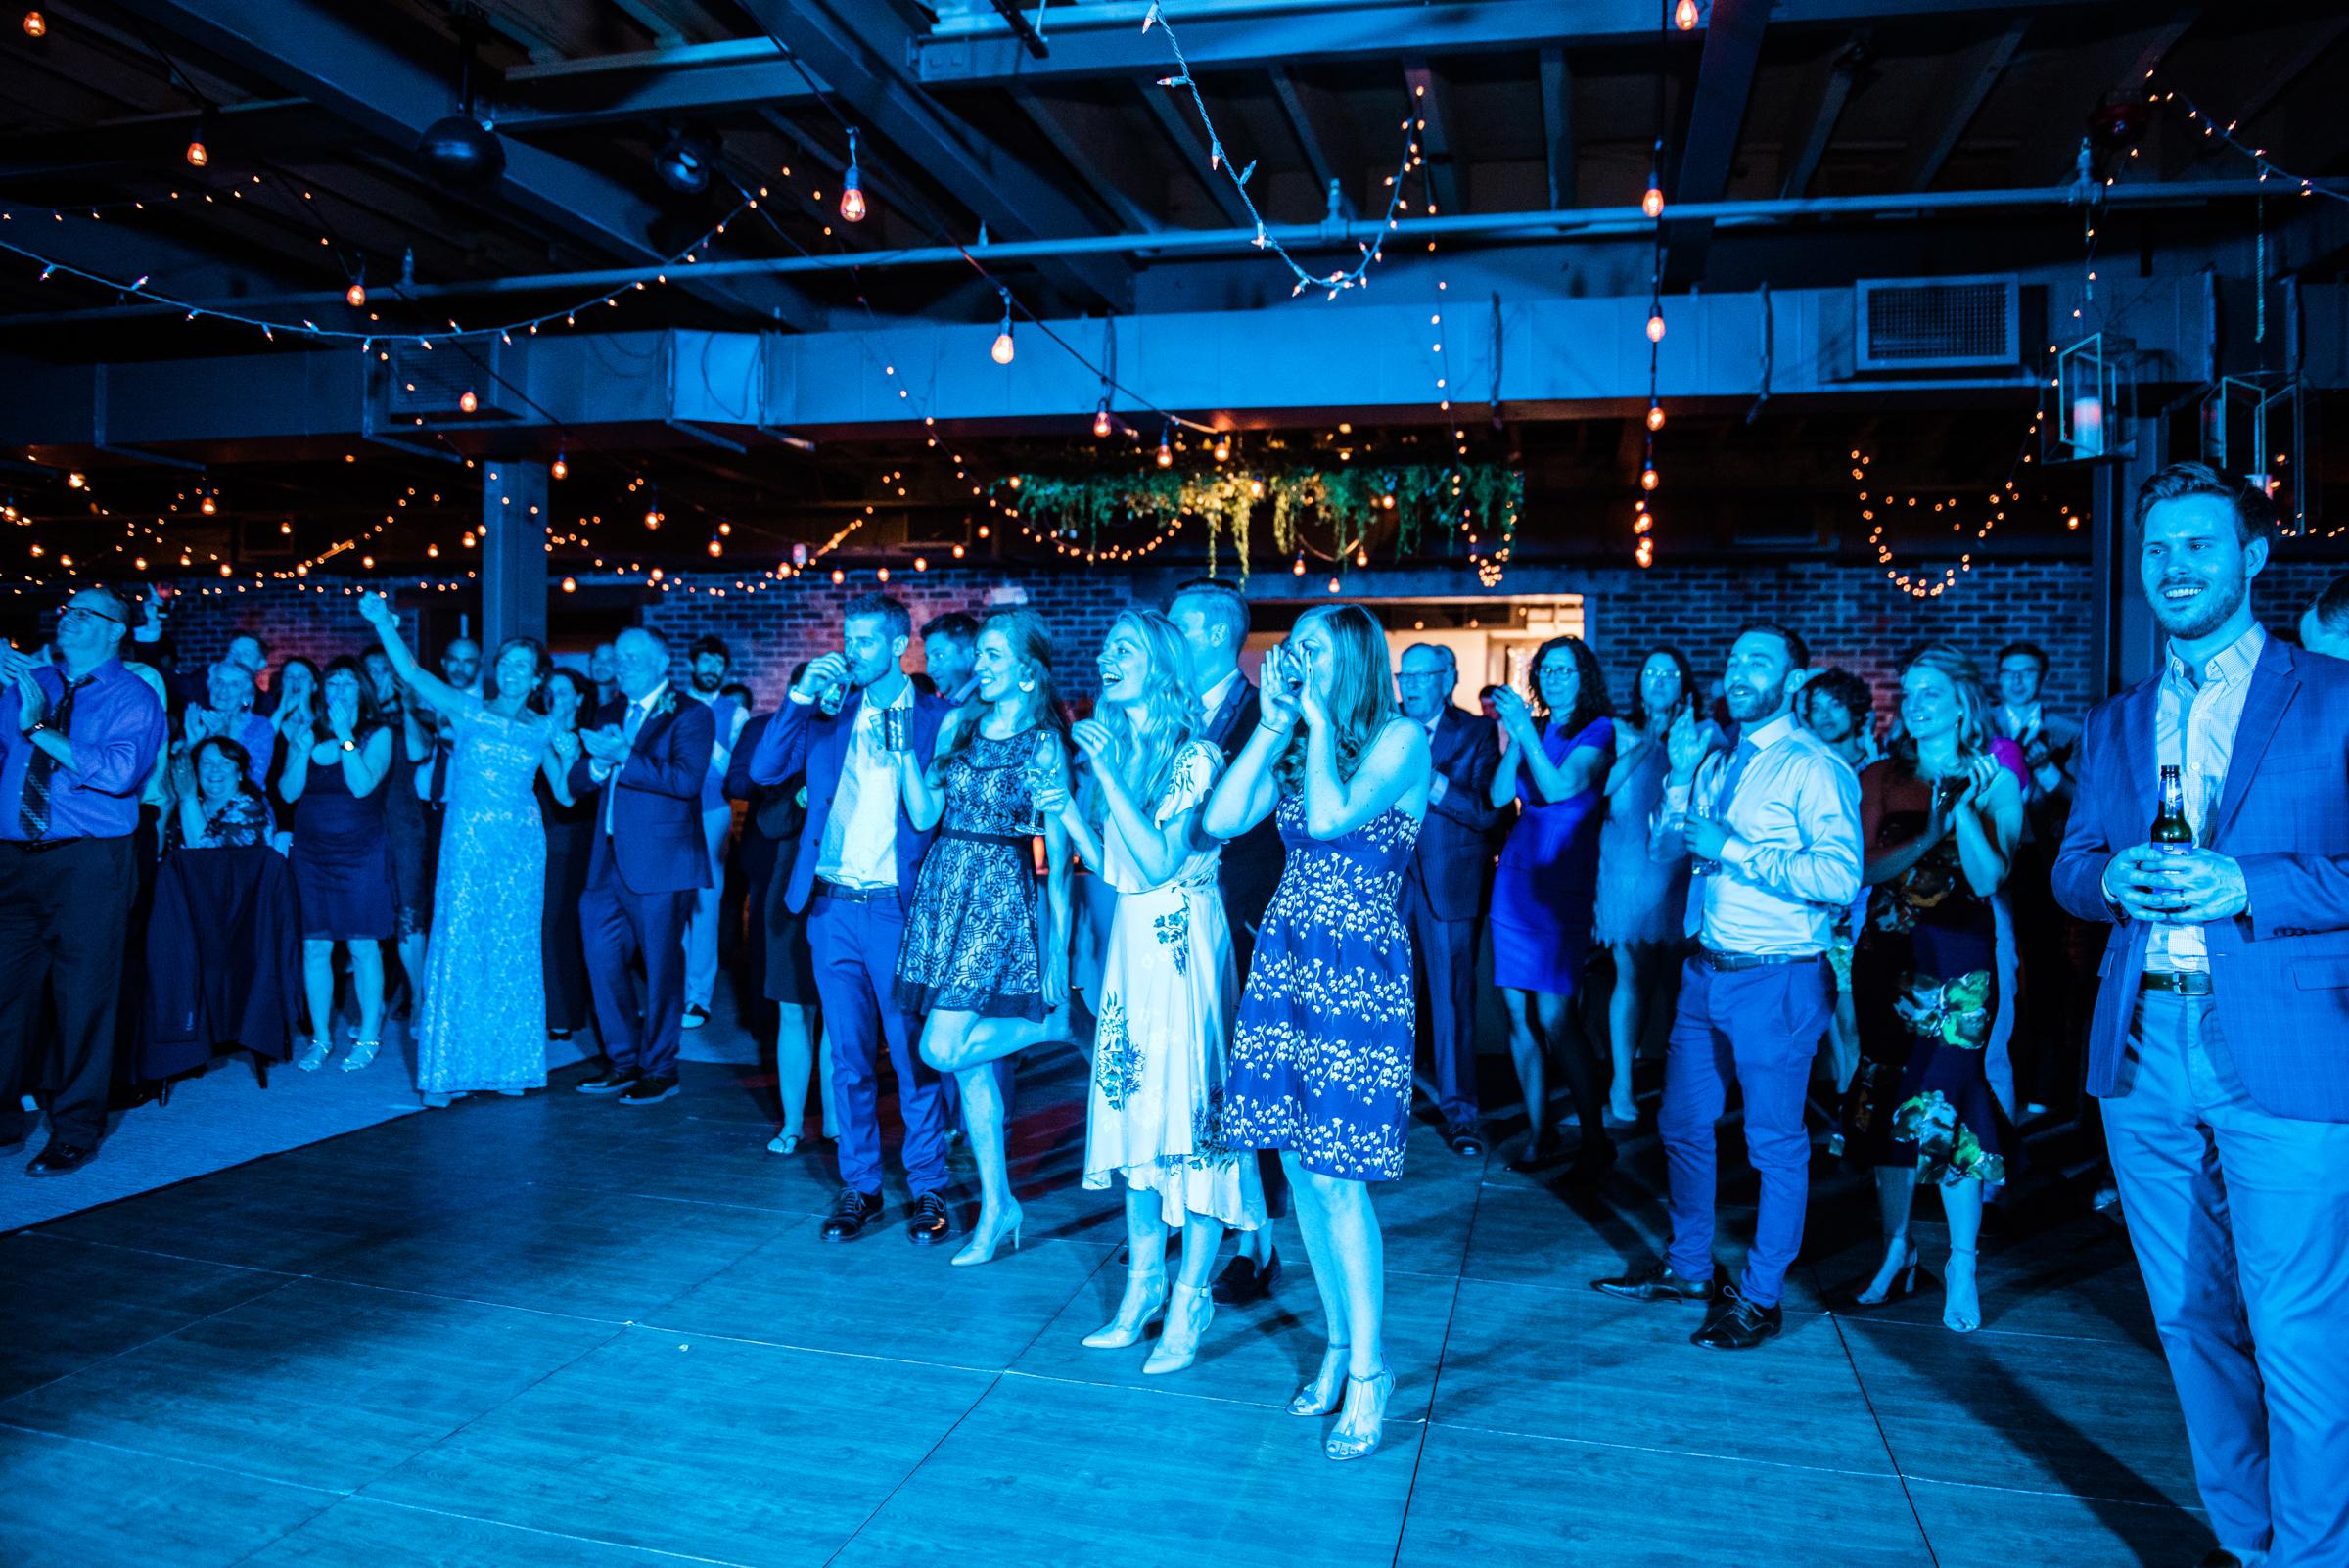 SKY_Armory_Syracuse_Wedding_JILL_STUDIO_Rochester_NY_Photographer_DSC_6648.jpg